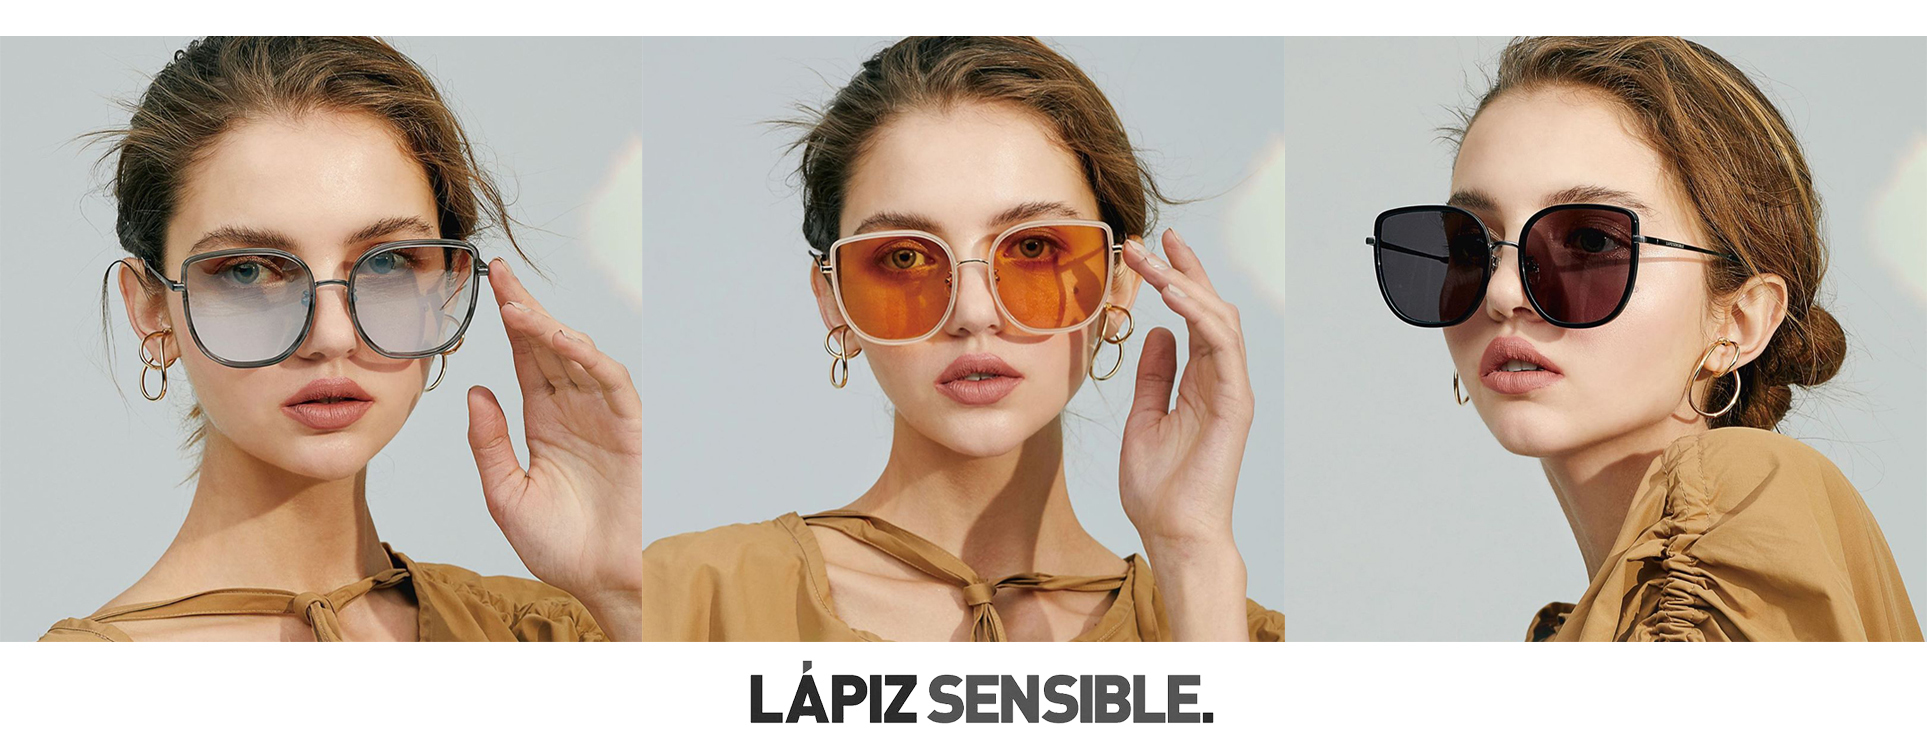 "<img src=""lapiz-sensible-eyewear-sunglasses.jpeg"" alt=""lapiz-sensible-eyewear-sunglasses"">"